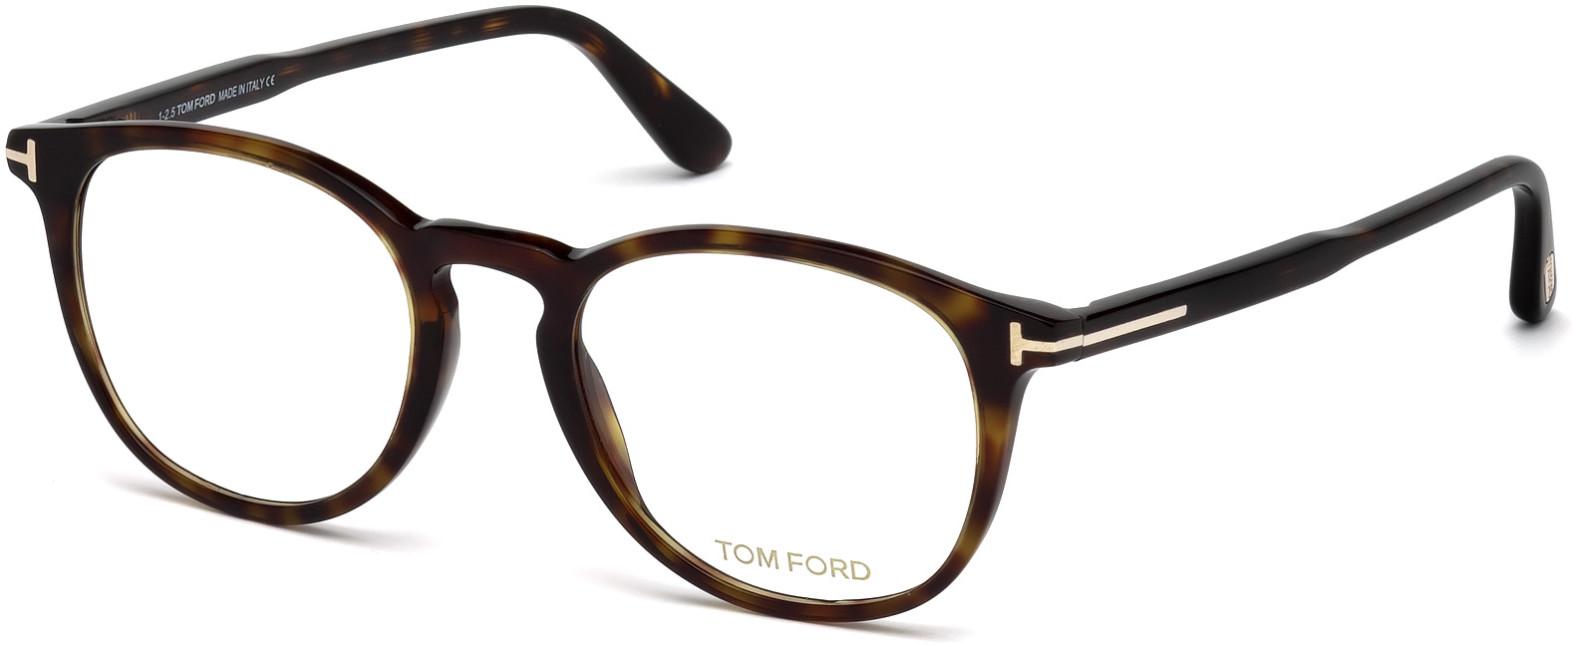 TOM FORD FT5401 style-color 052   - dark havana